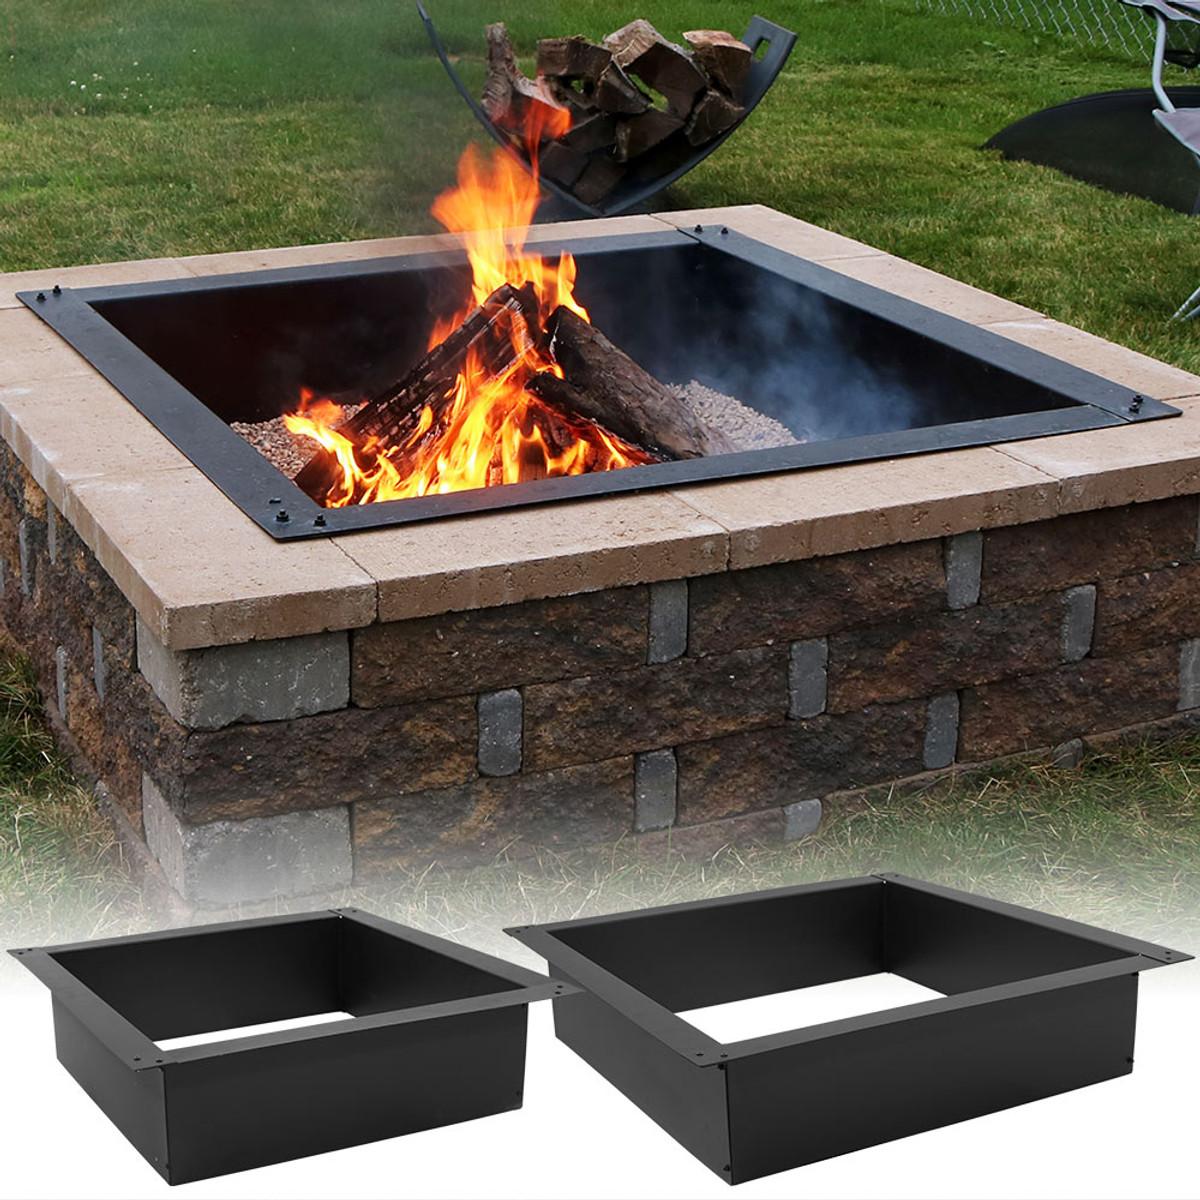 sunnydaze decor heavy-duty square fire pit liner